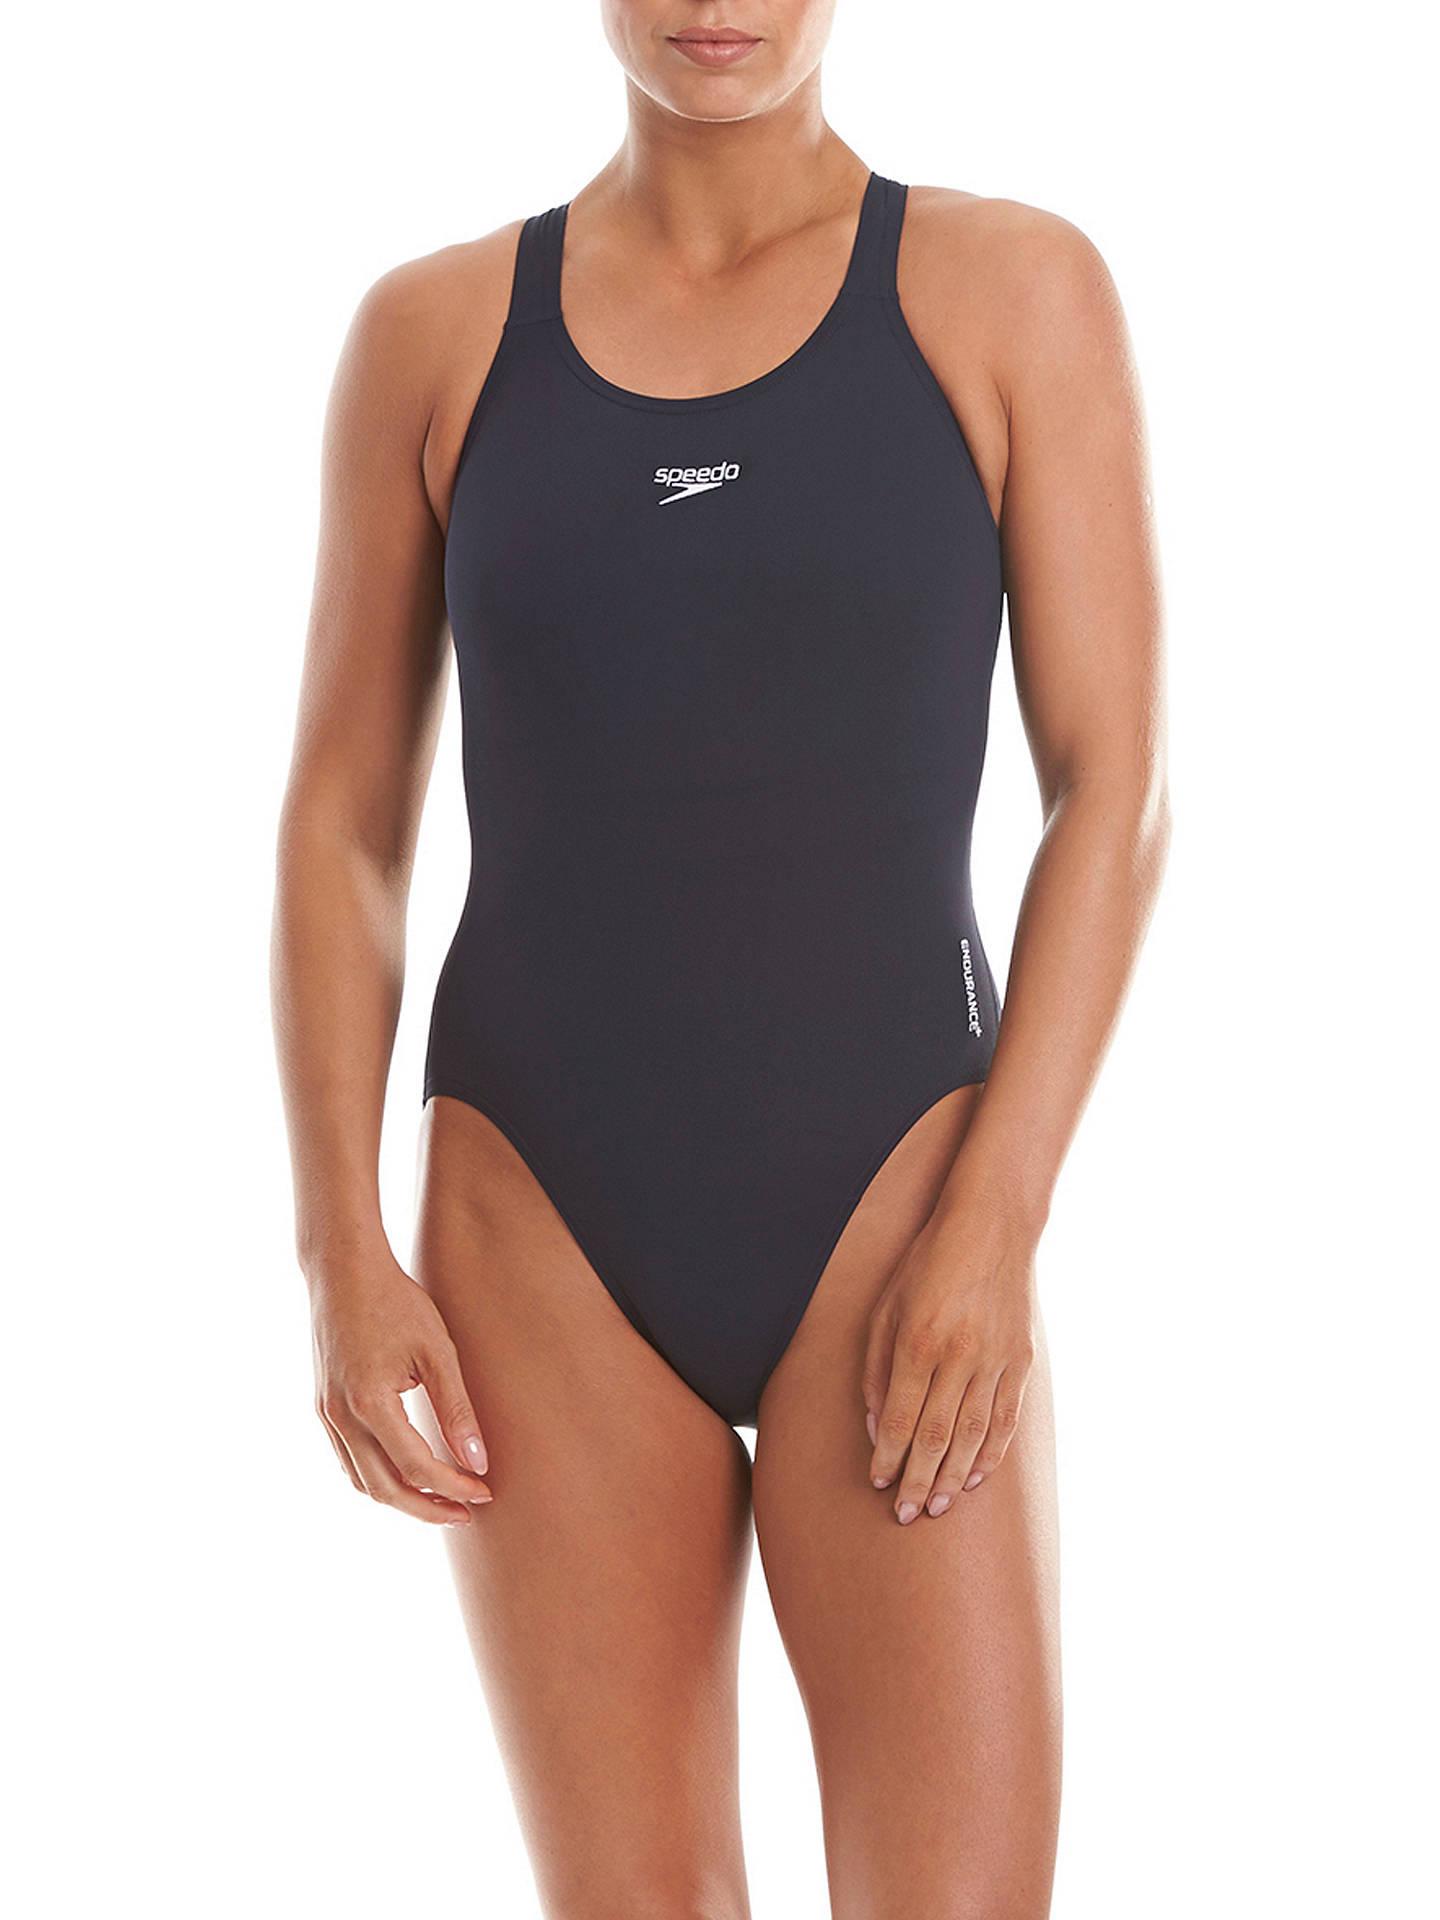 b81c897c29307 BuySpeedo Endurance+ Medalist Swimsuit